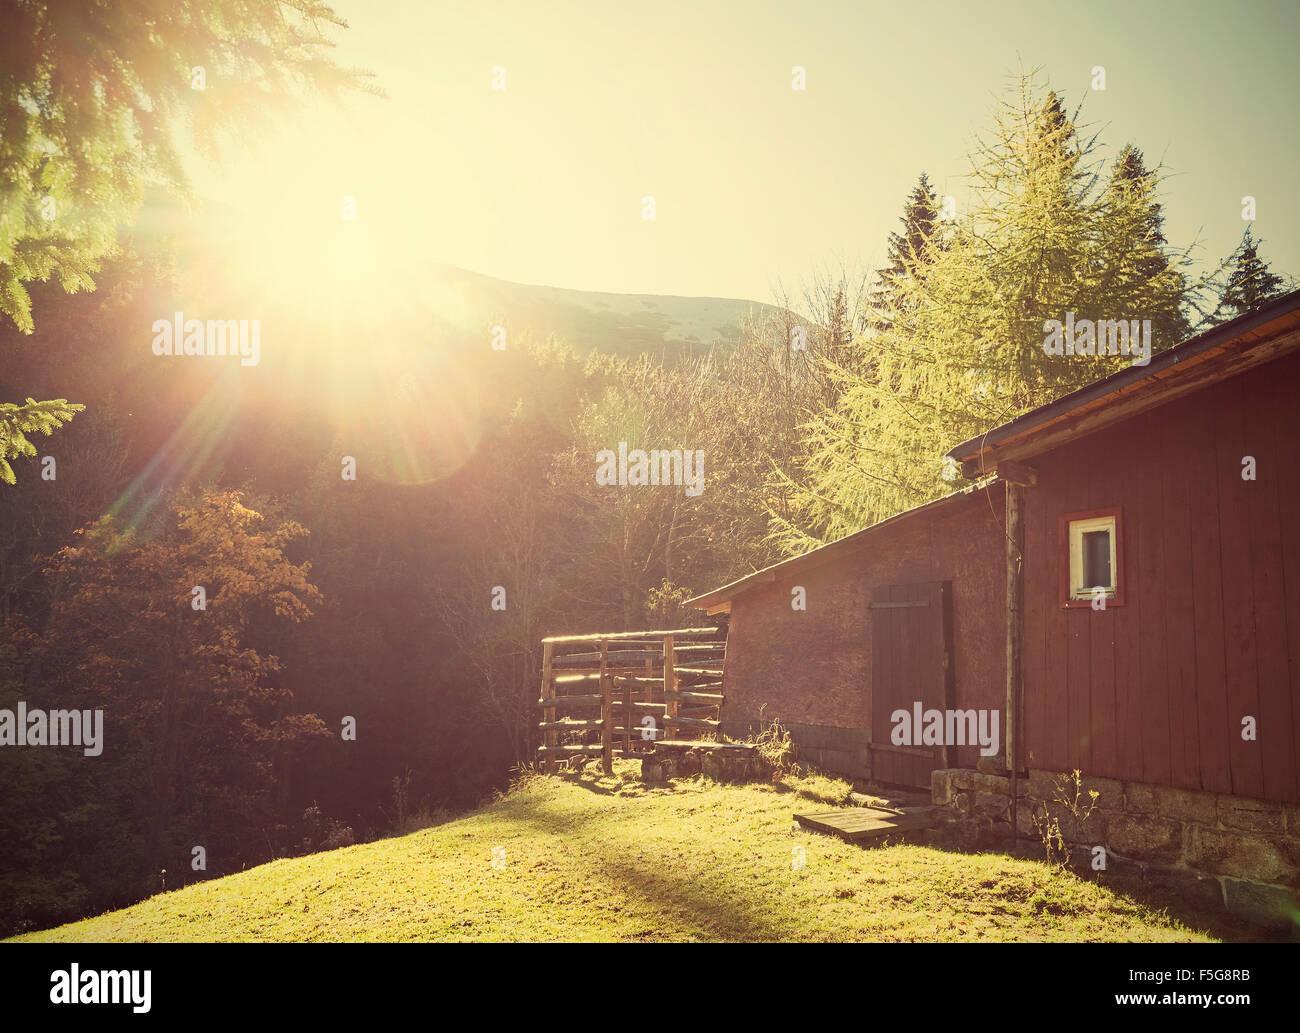 Retro Vintage stilisierte Berghütte gegen Sonne mit Flare-Effekt. Stockbild